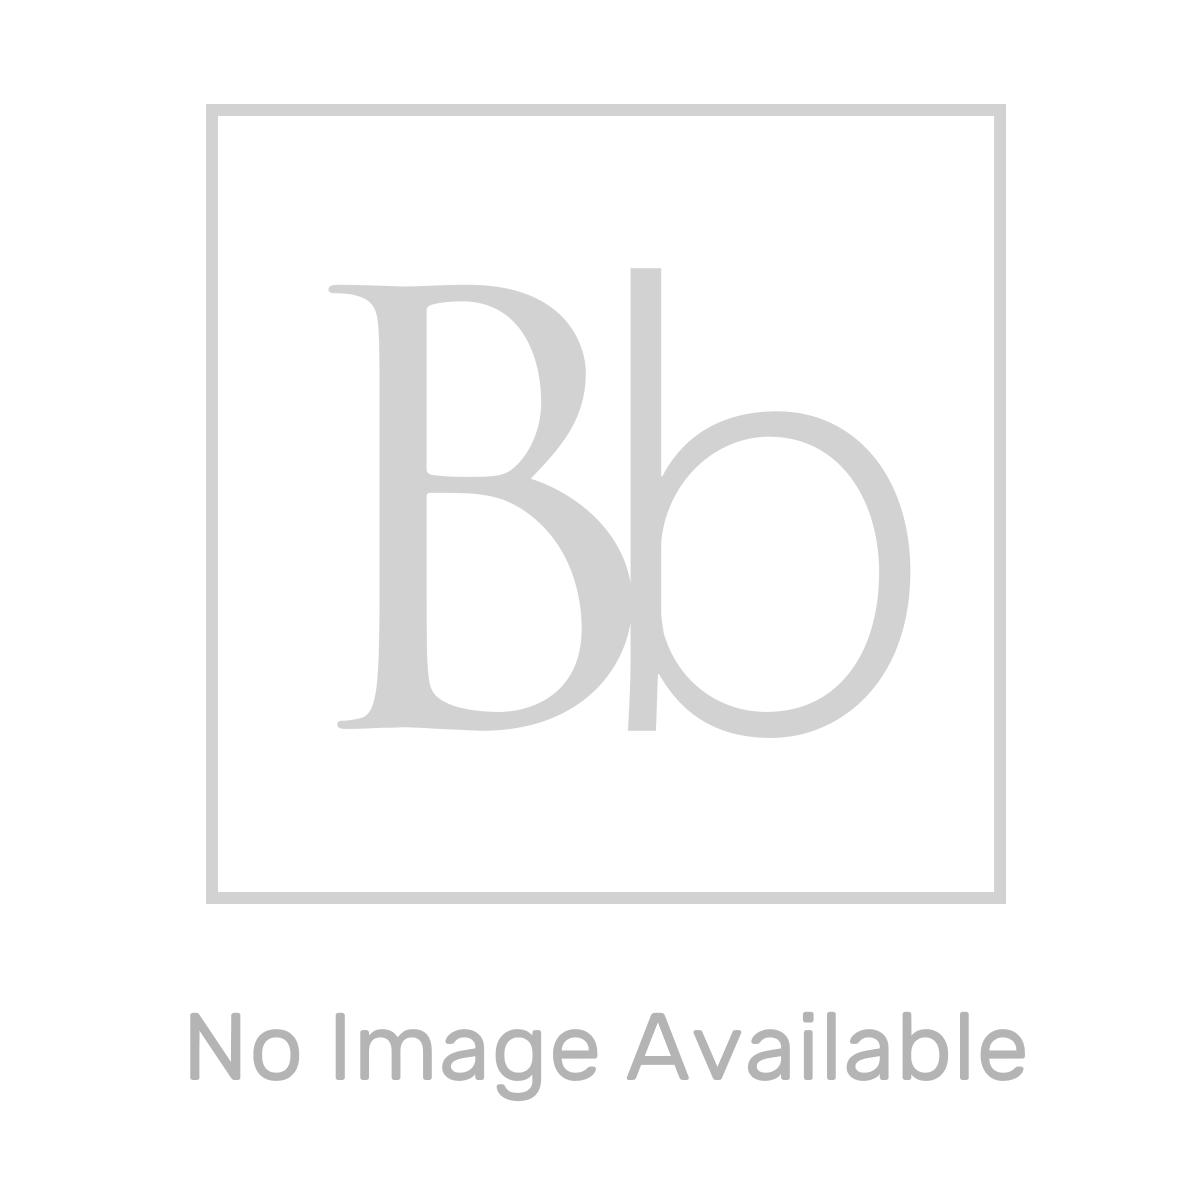 RAK Surface Cool Grey Lappato Tile 600 x 1200mm Lifestyle